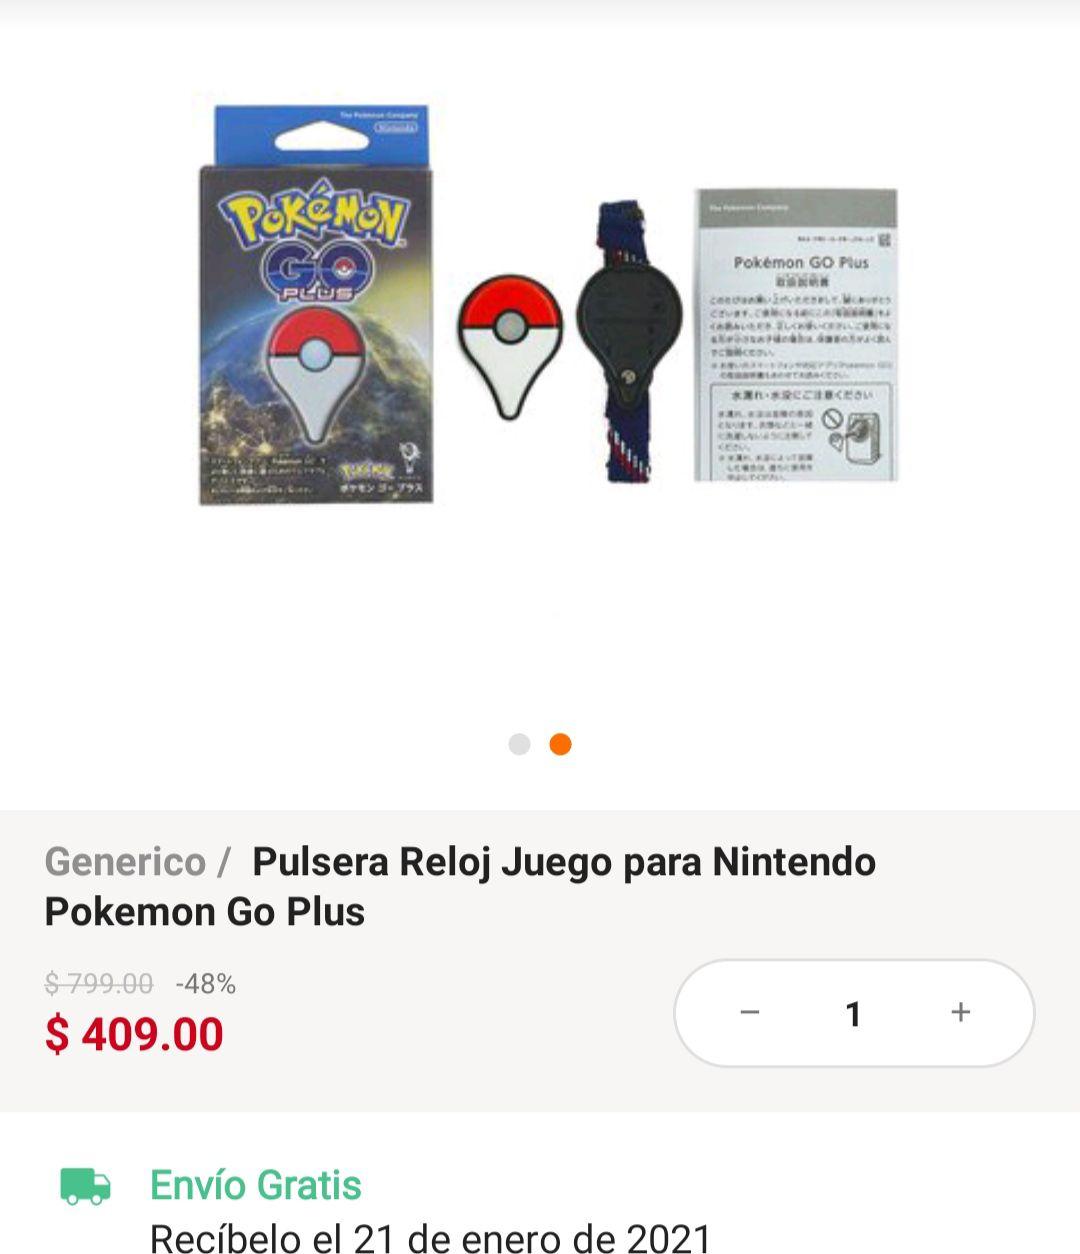 Linio: Pulsera Pokémon Go Plus